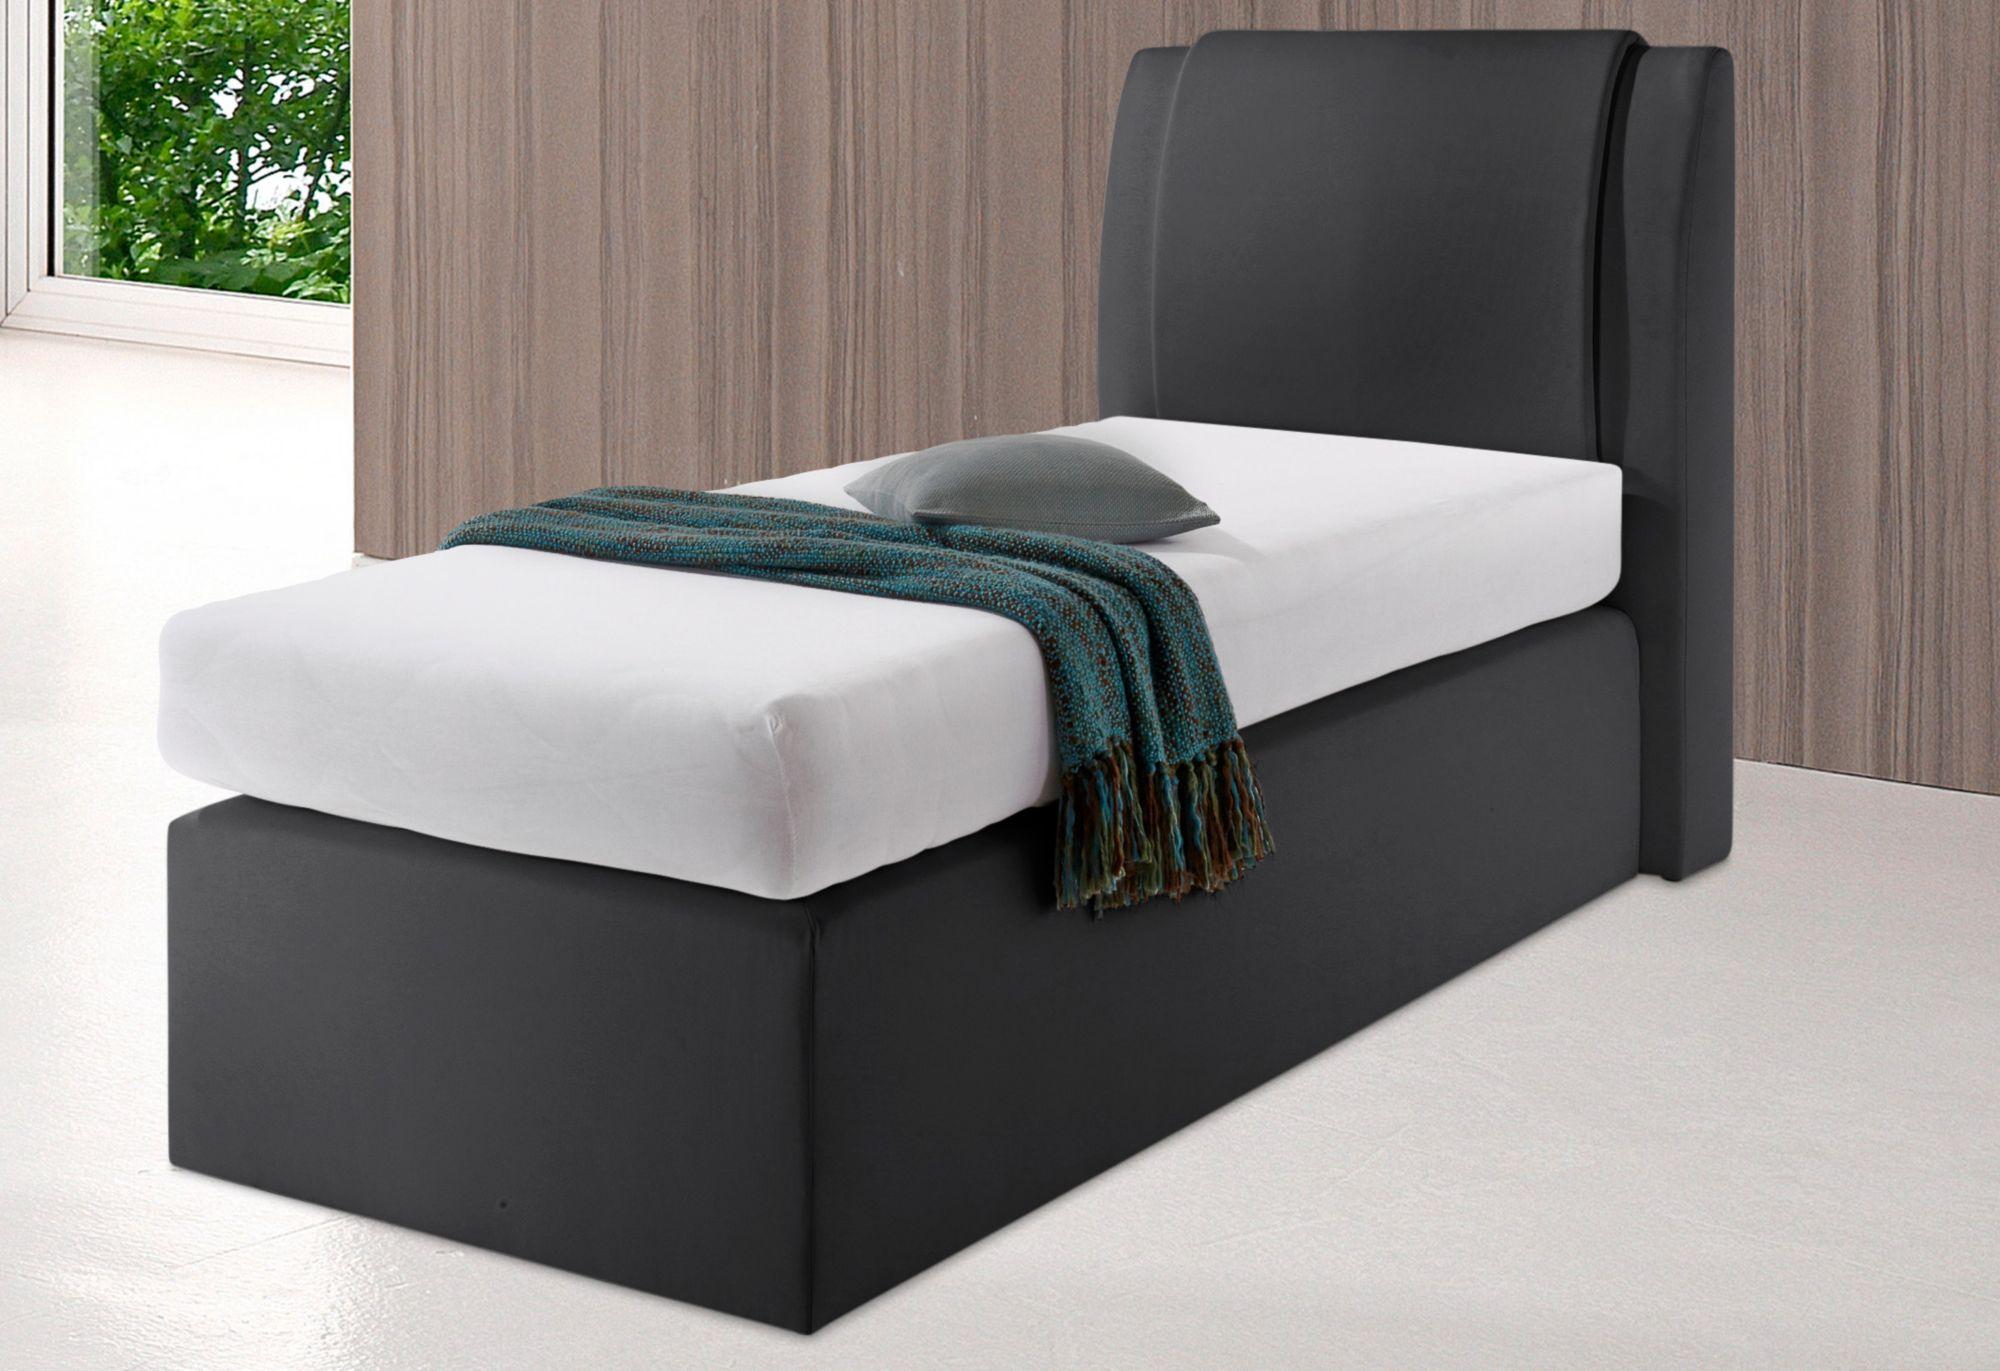 westfalia polsterbetten boxspringbett schwab versand betten. Black Bedroom Furniture Sets. Home Design Ideas